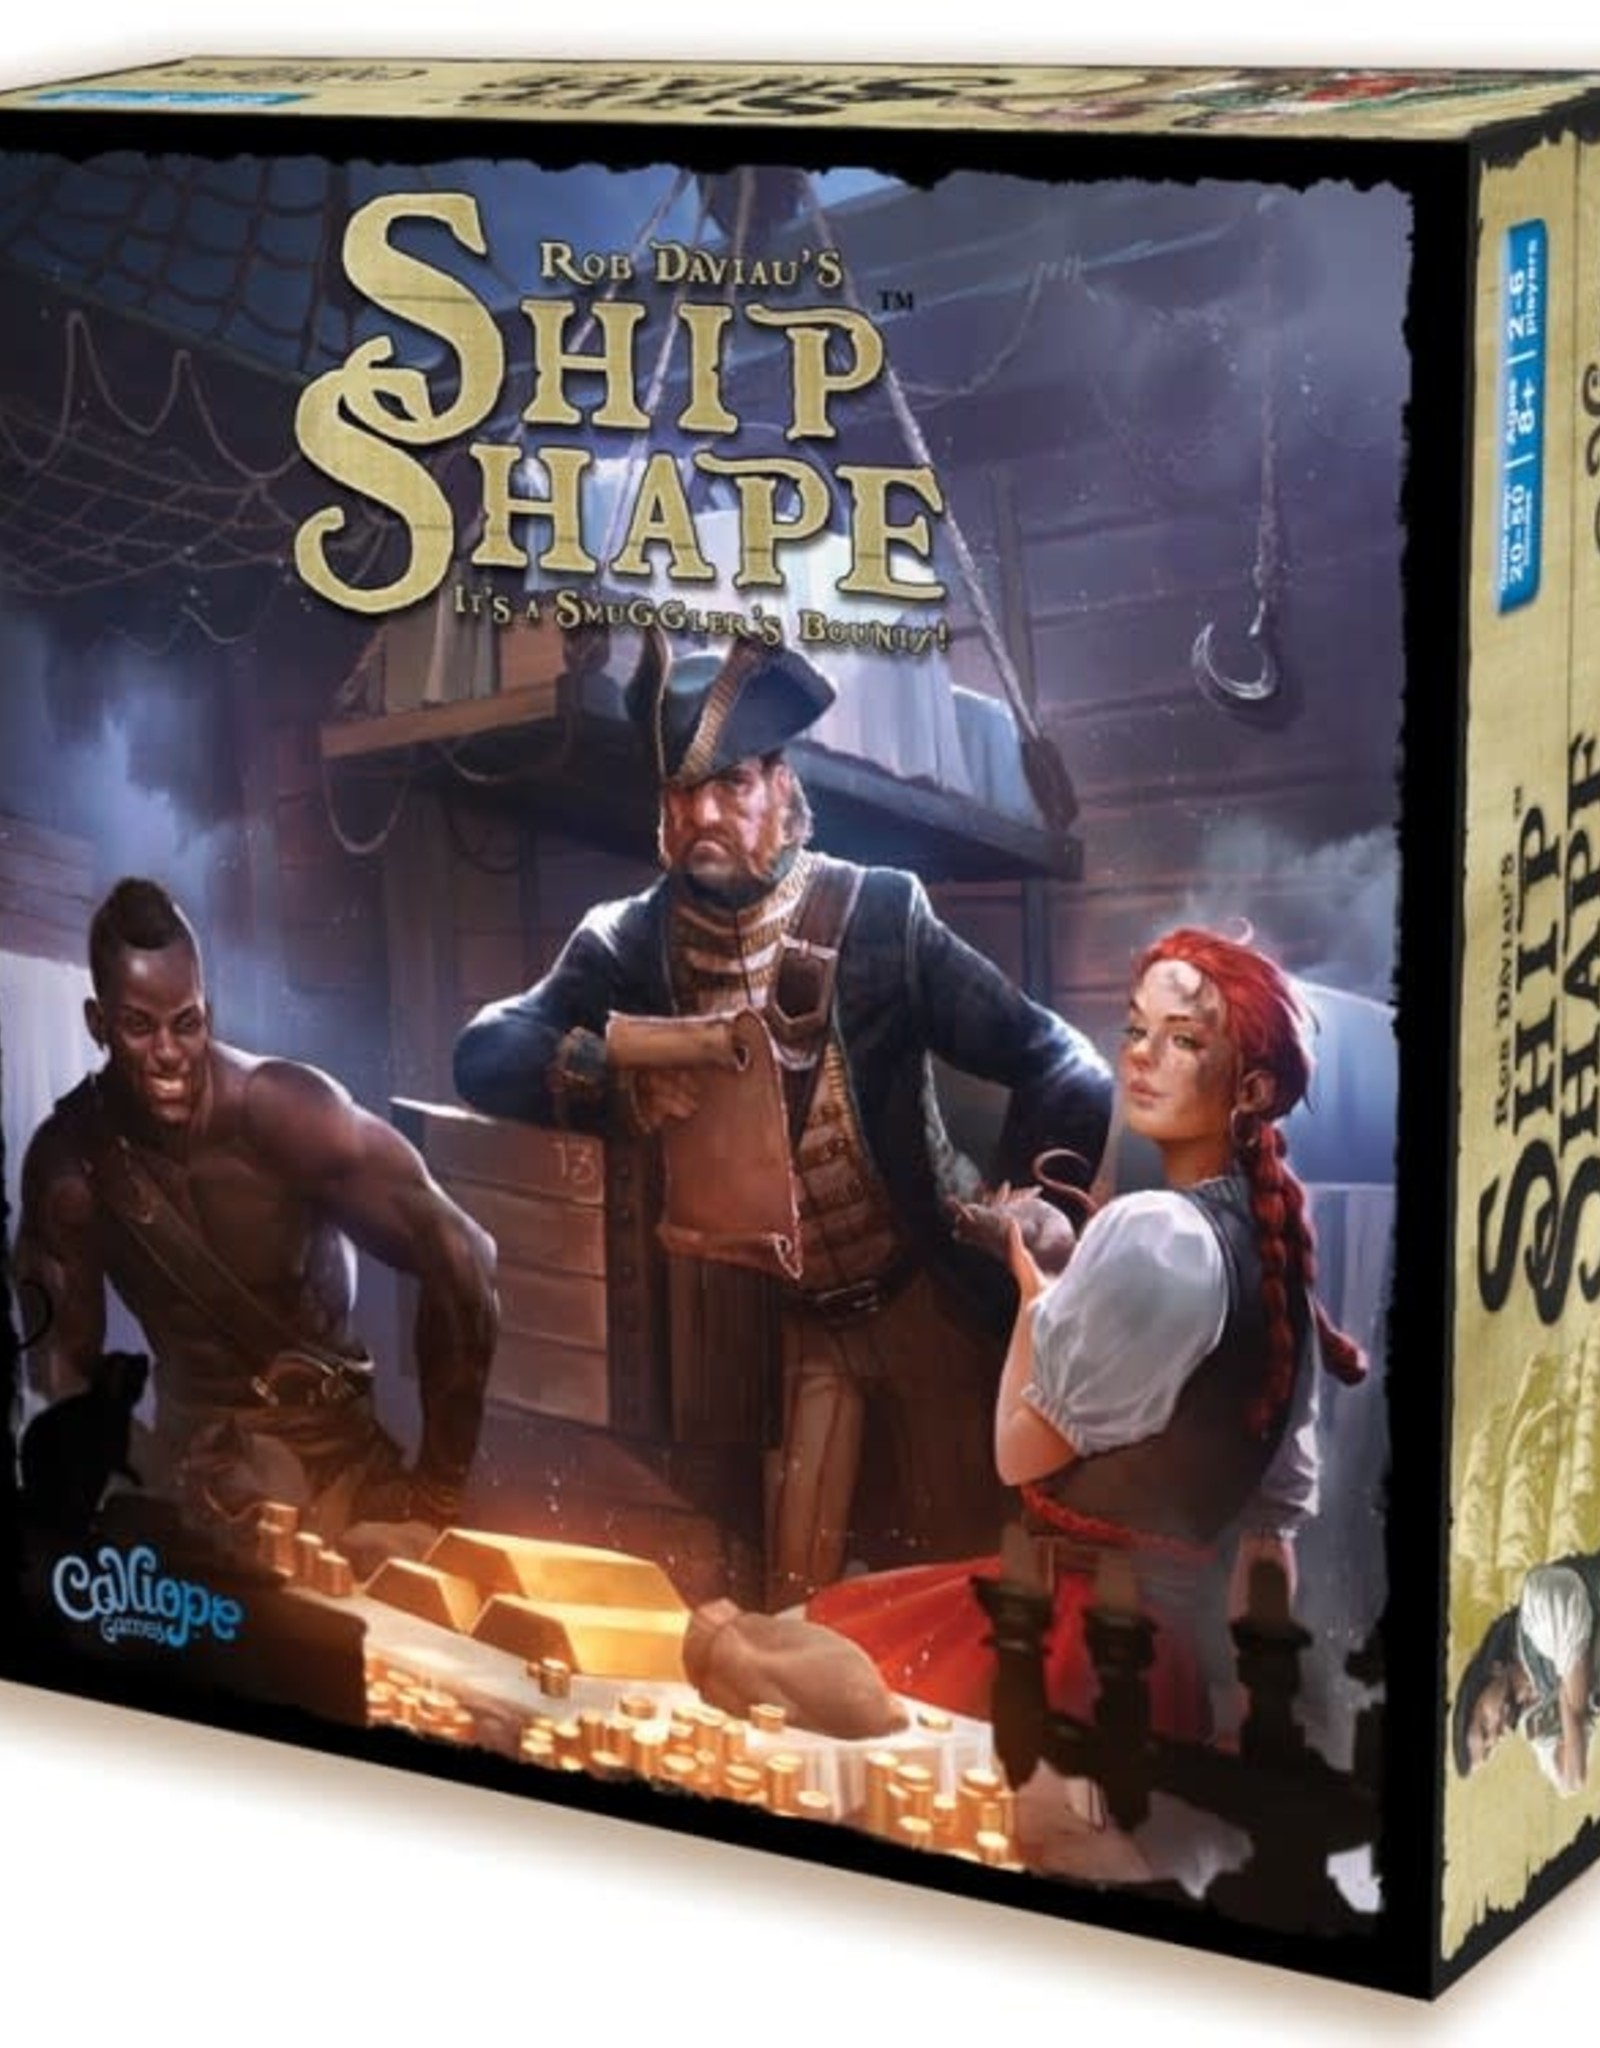 Rental RENTAL - ShipShape 2 lb 3.1